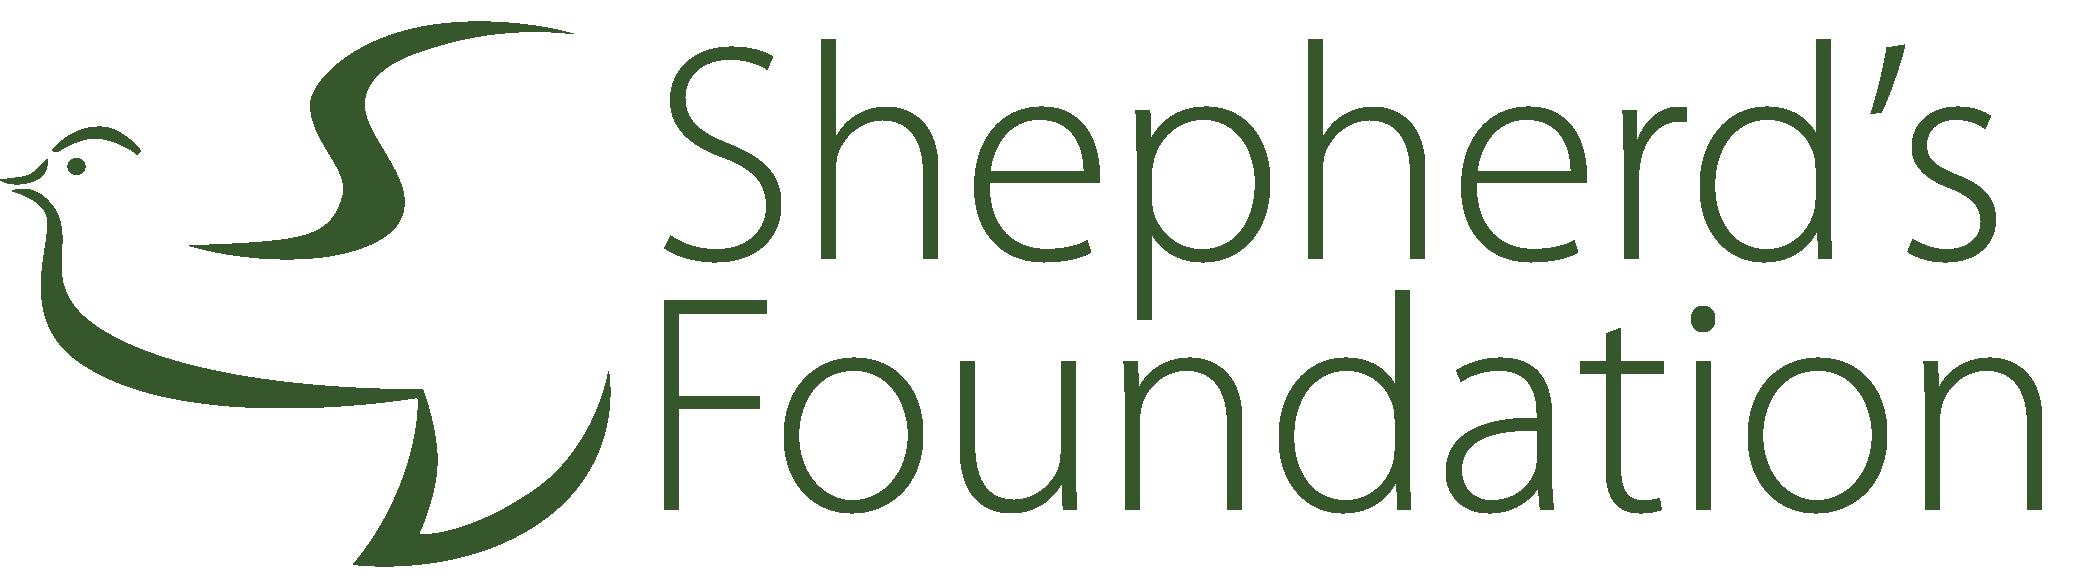 shepherdfoundation